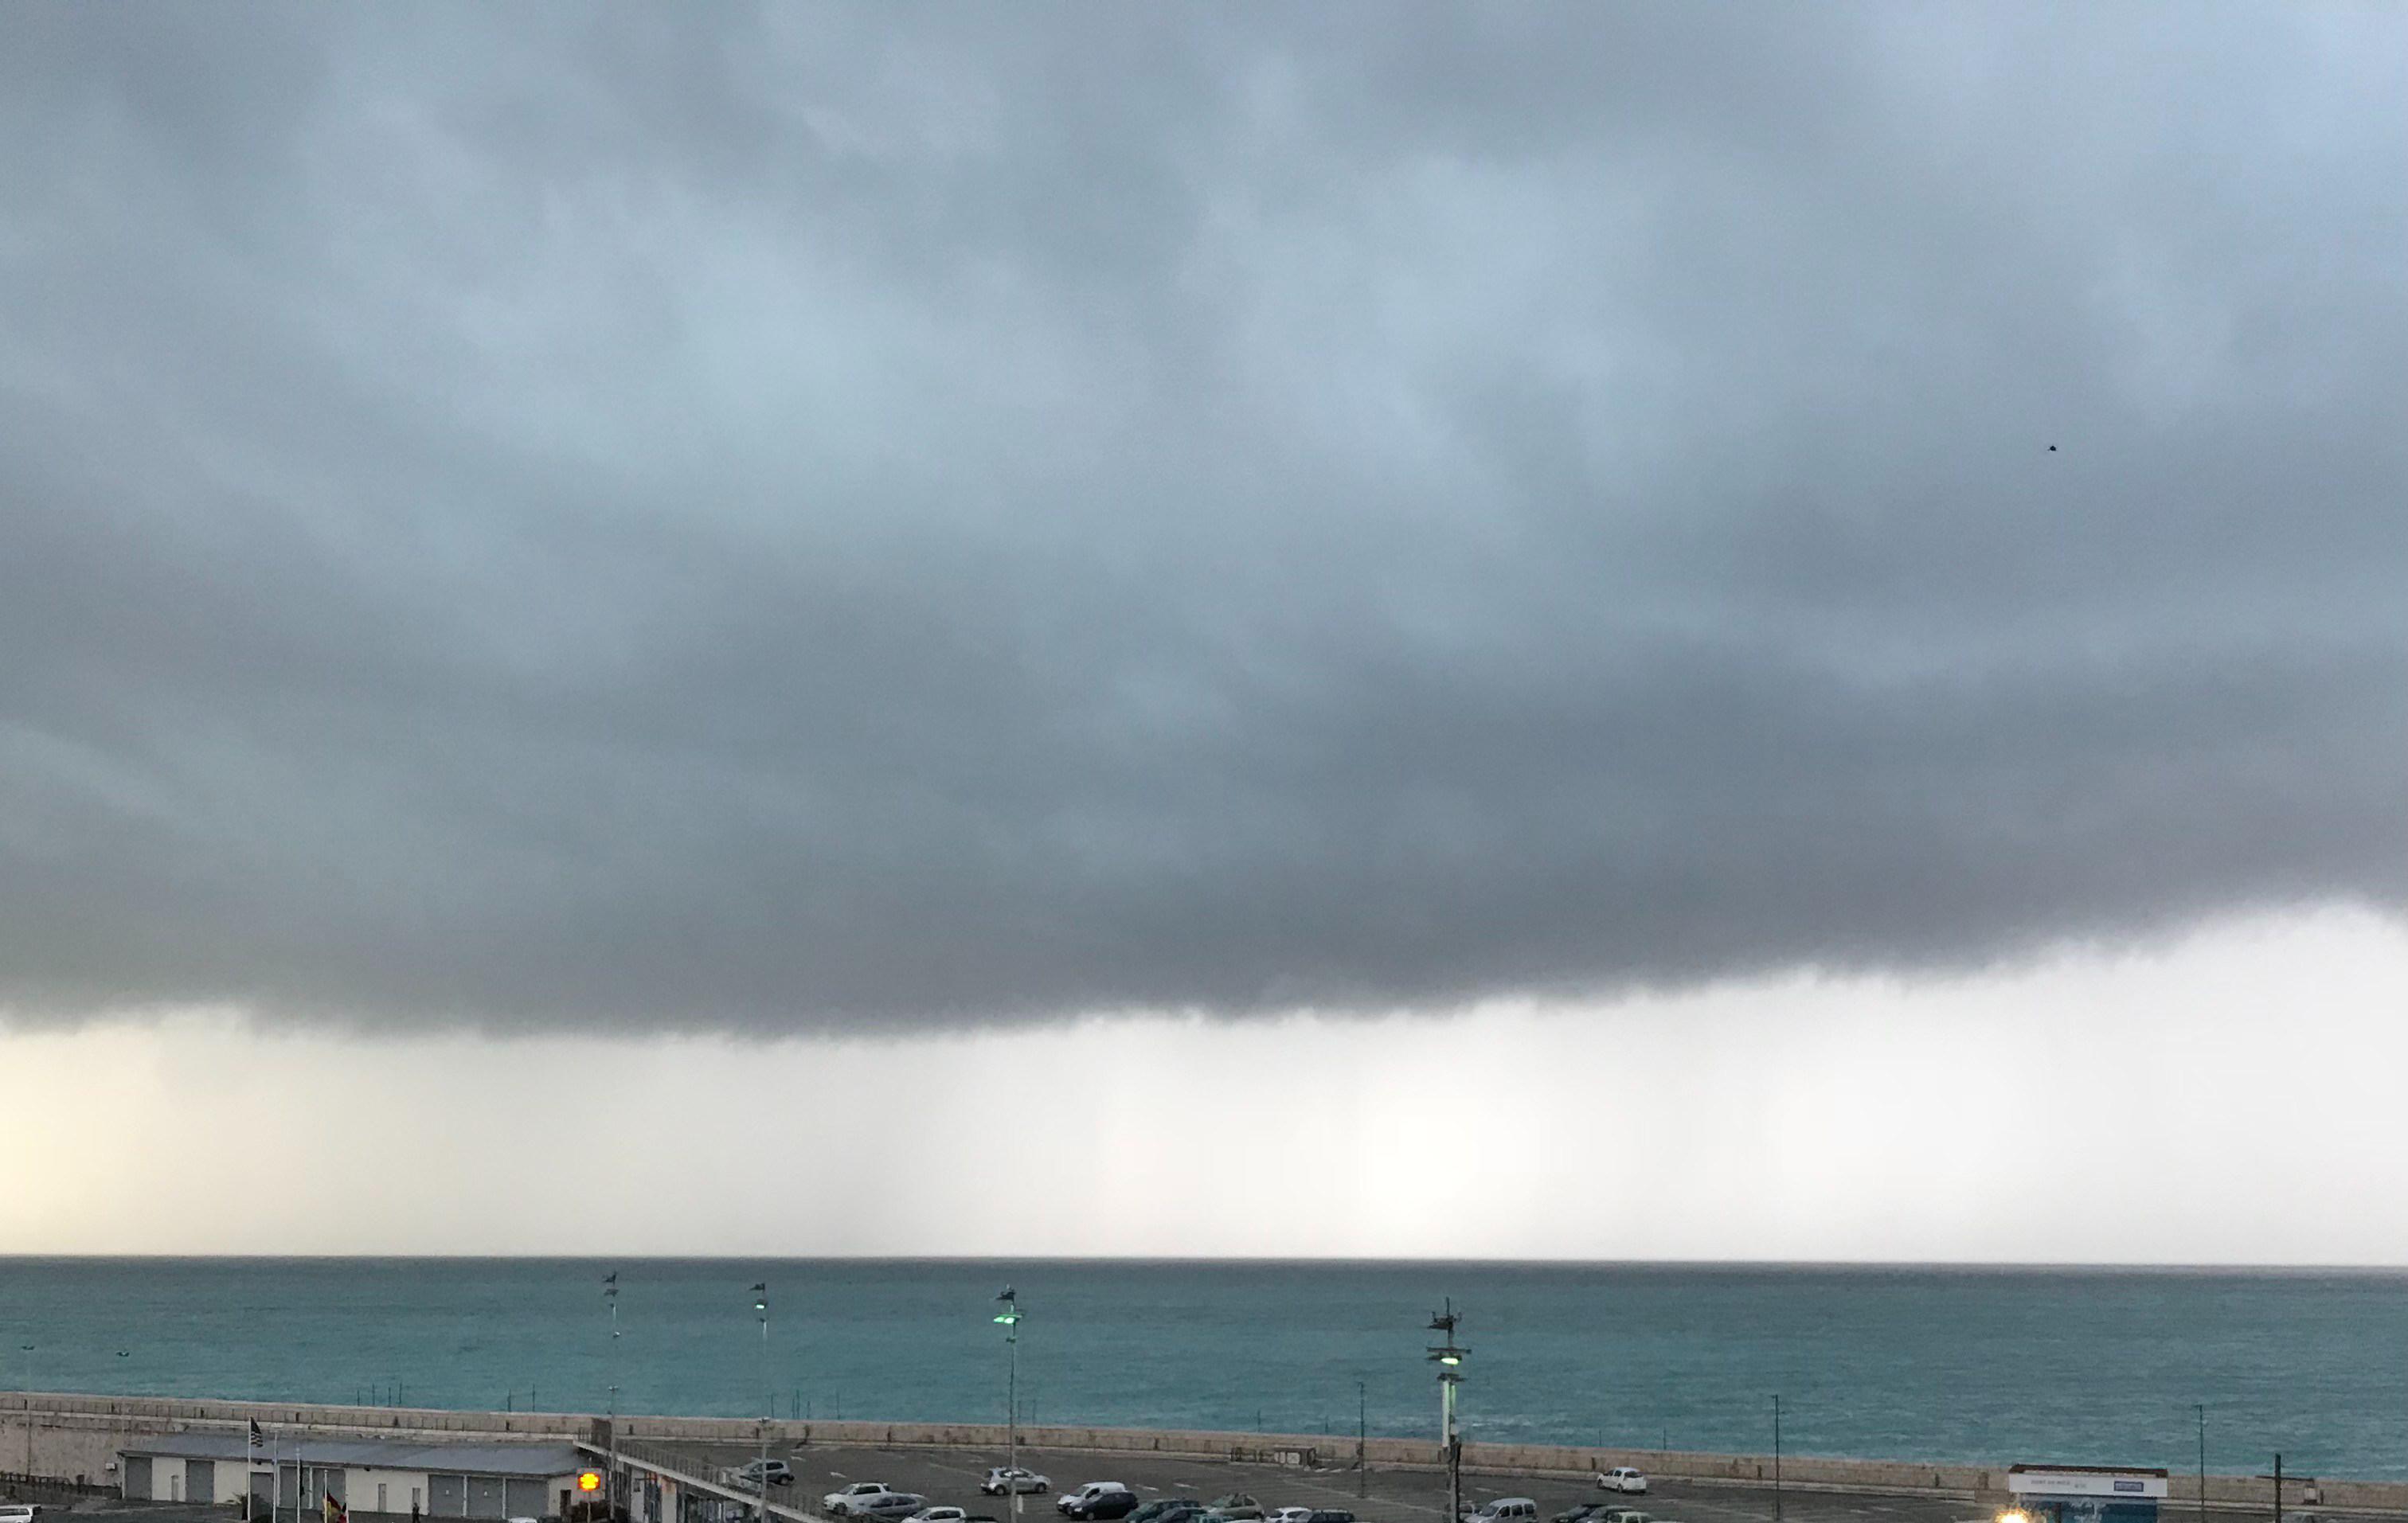 Storm nice port